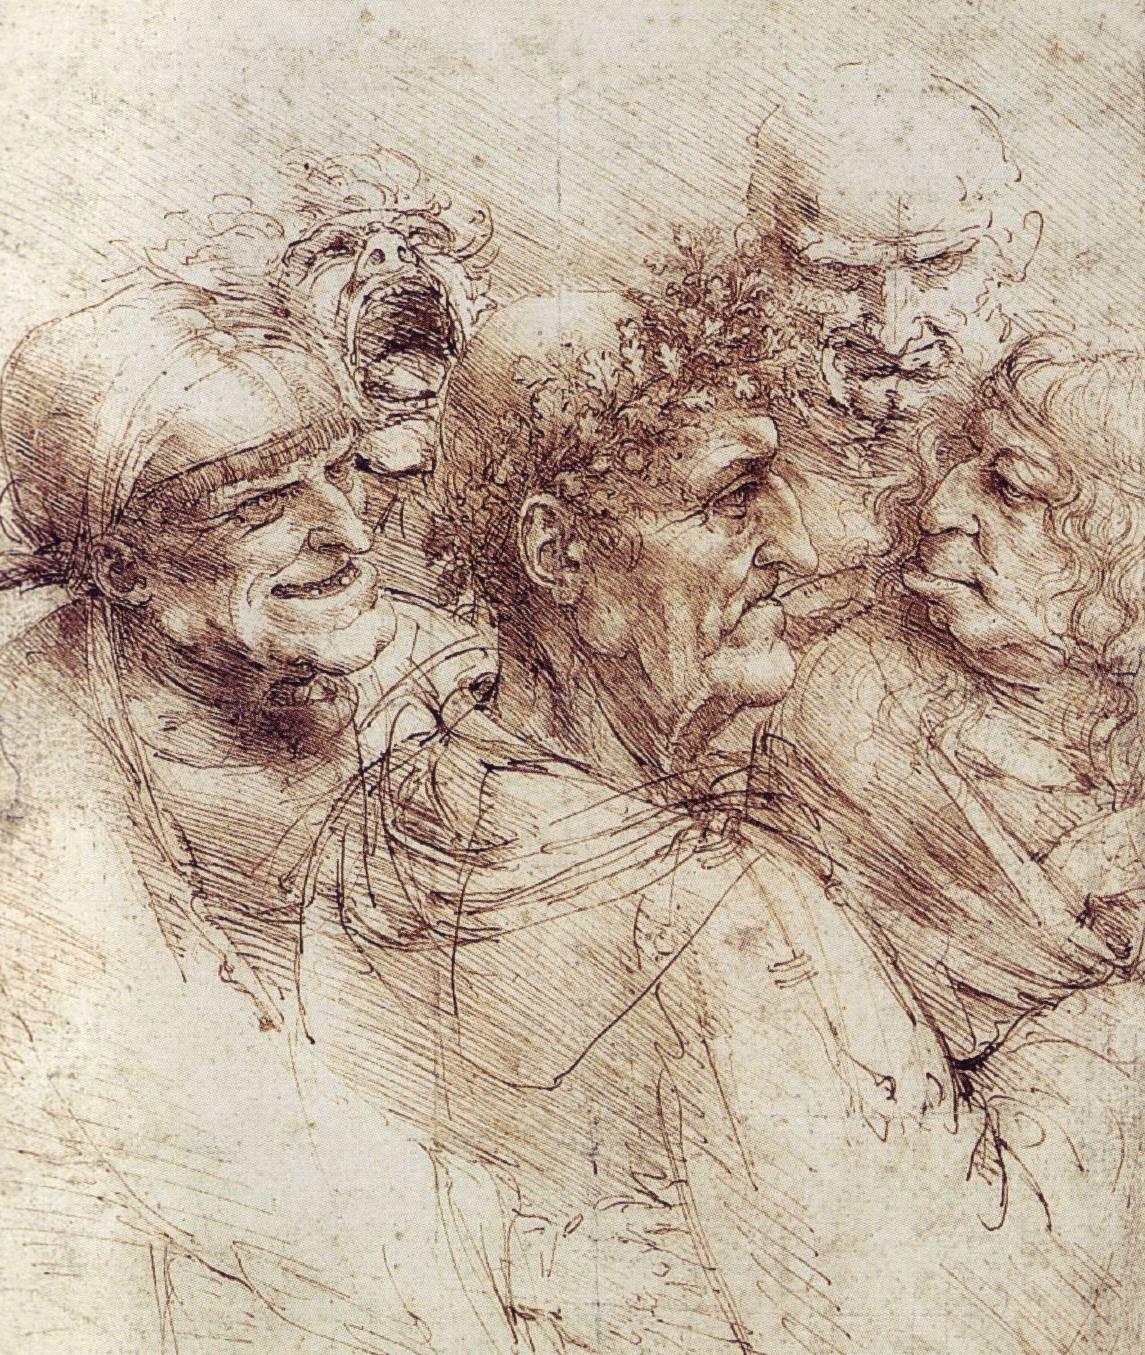 56 dessins de leonard de vinci - Photo leonard de vinci ...